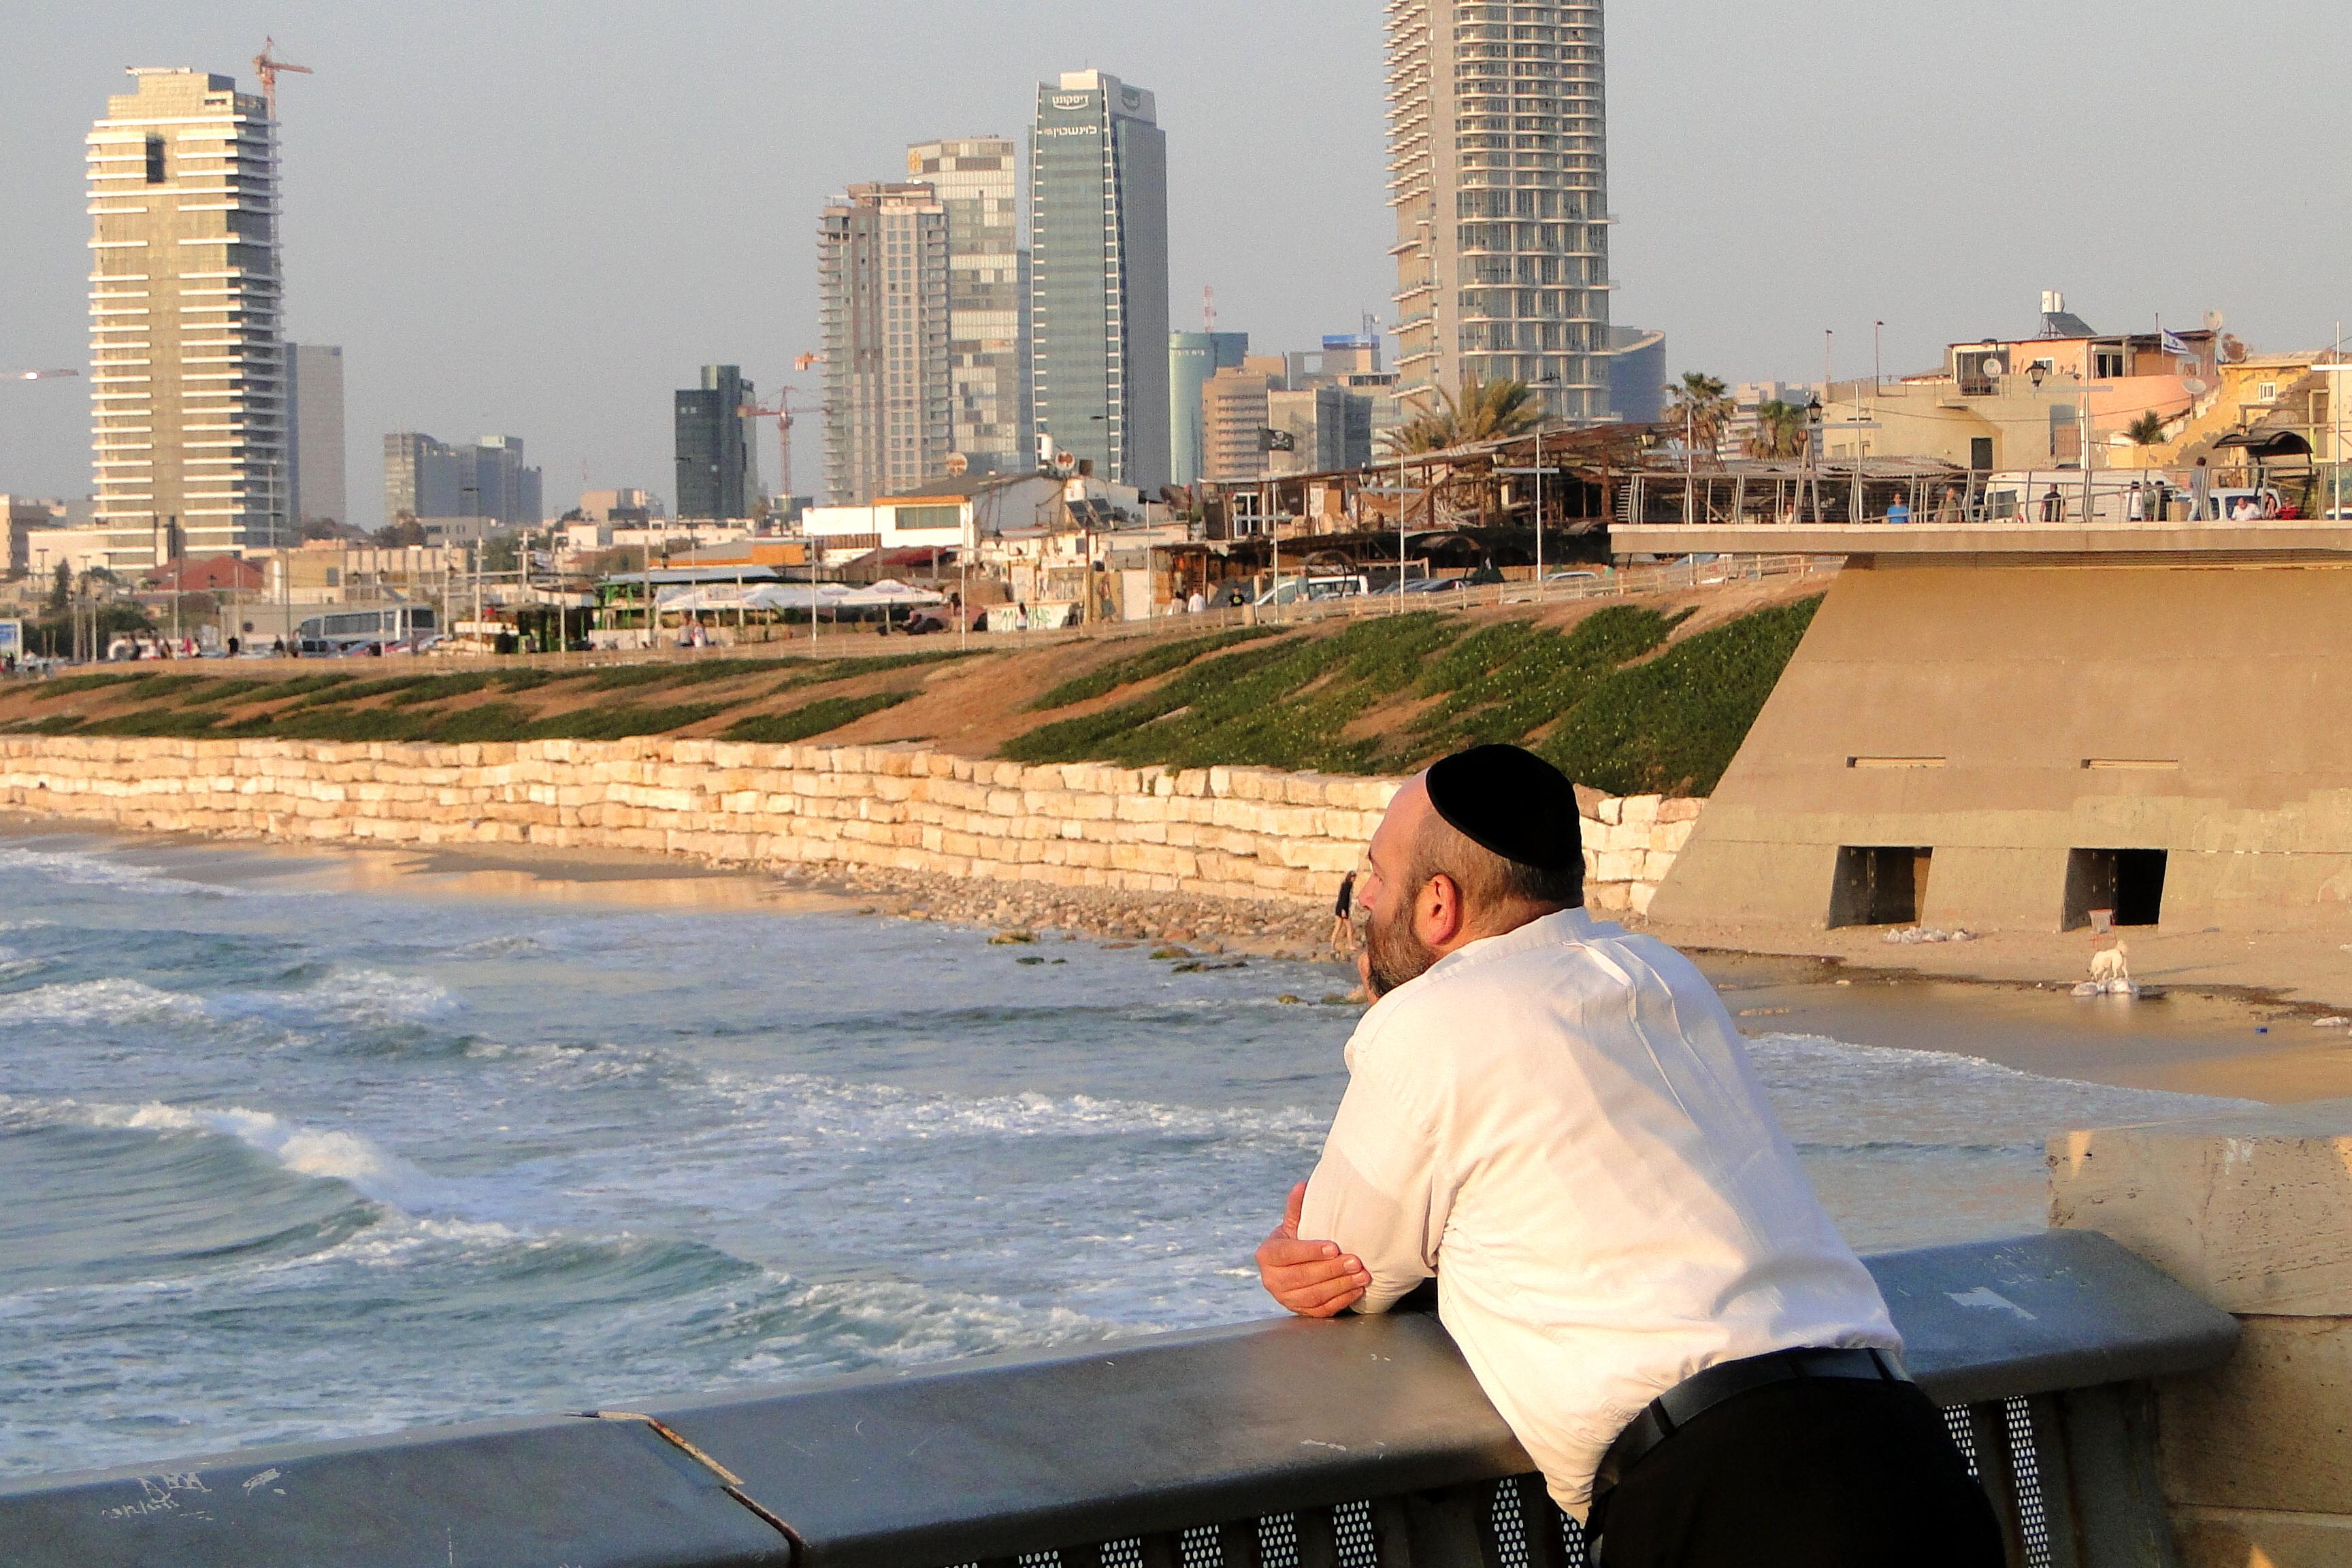 File:Jewish Man Looks Out over Tel Aviv Seashore - Yafo (Jaffa) -